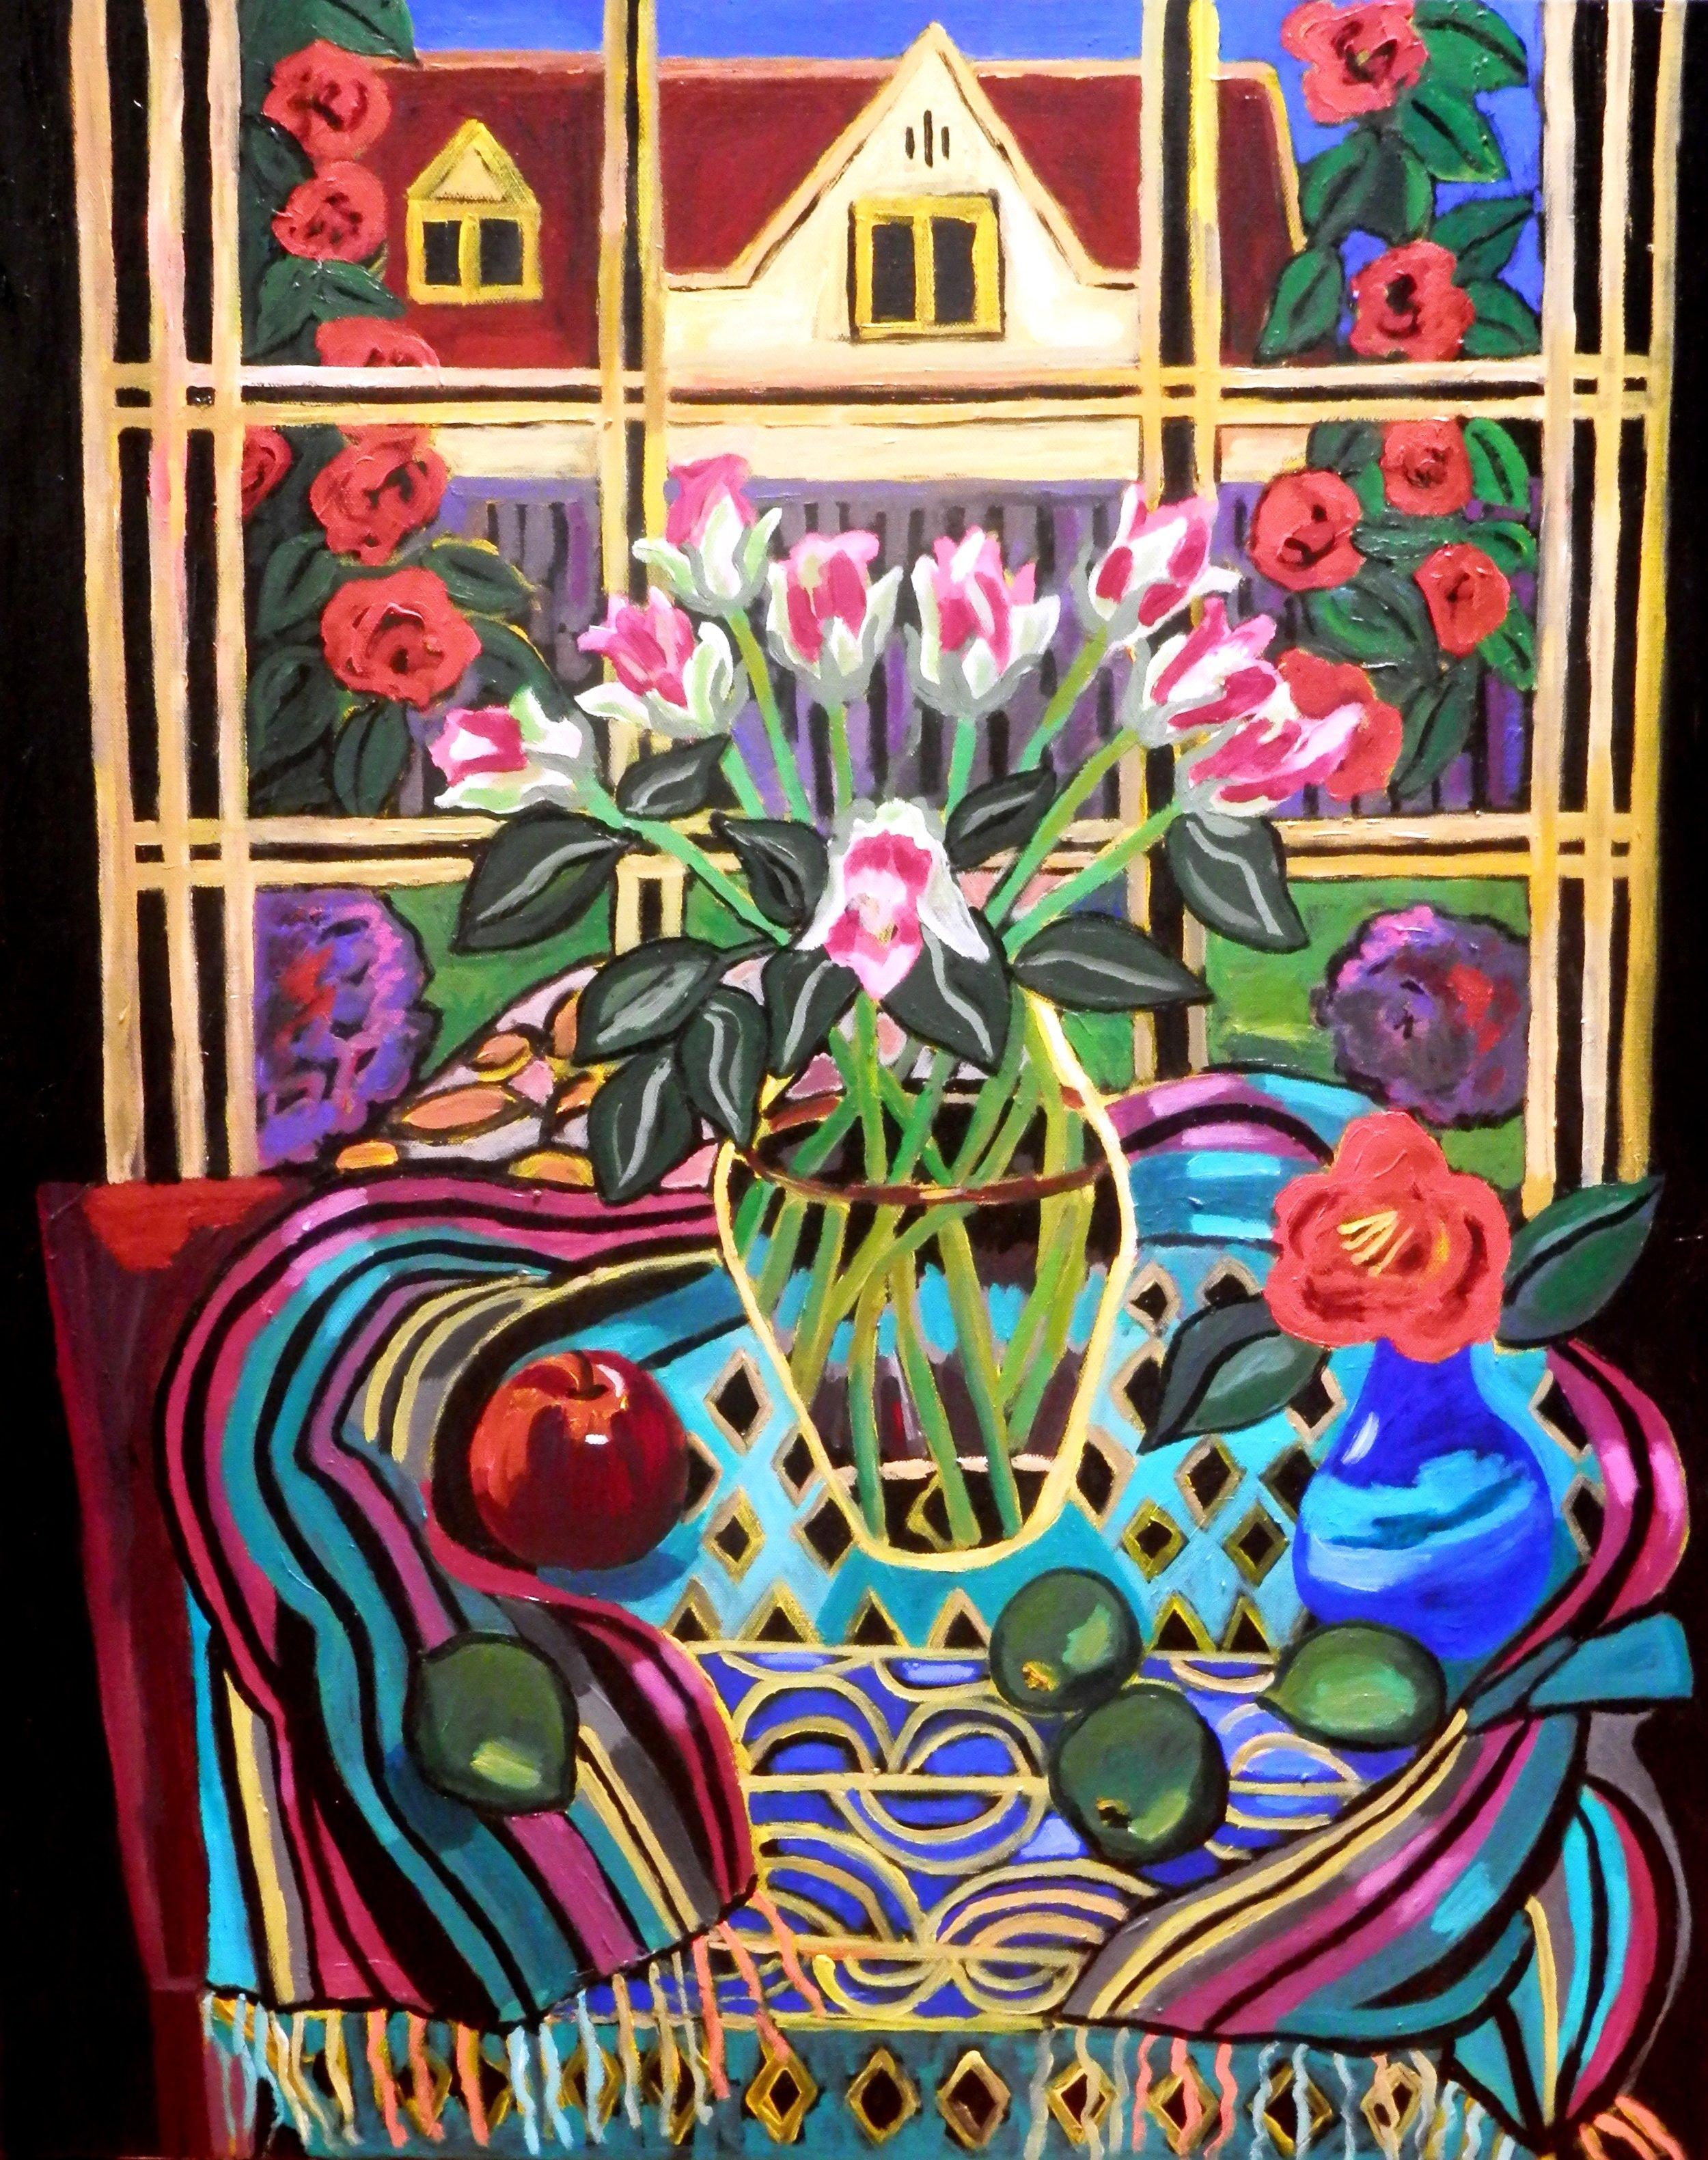 Pink Roses & Camellias     Acrylic on canvas.    77 cm x 61 cm    $1,100.00